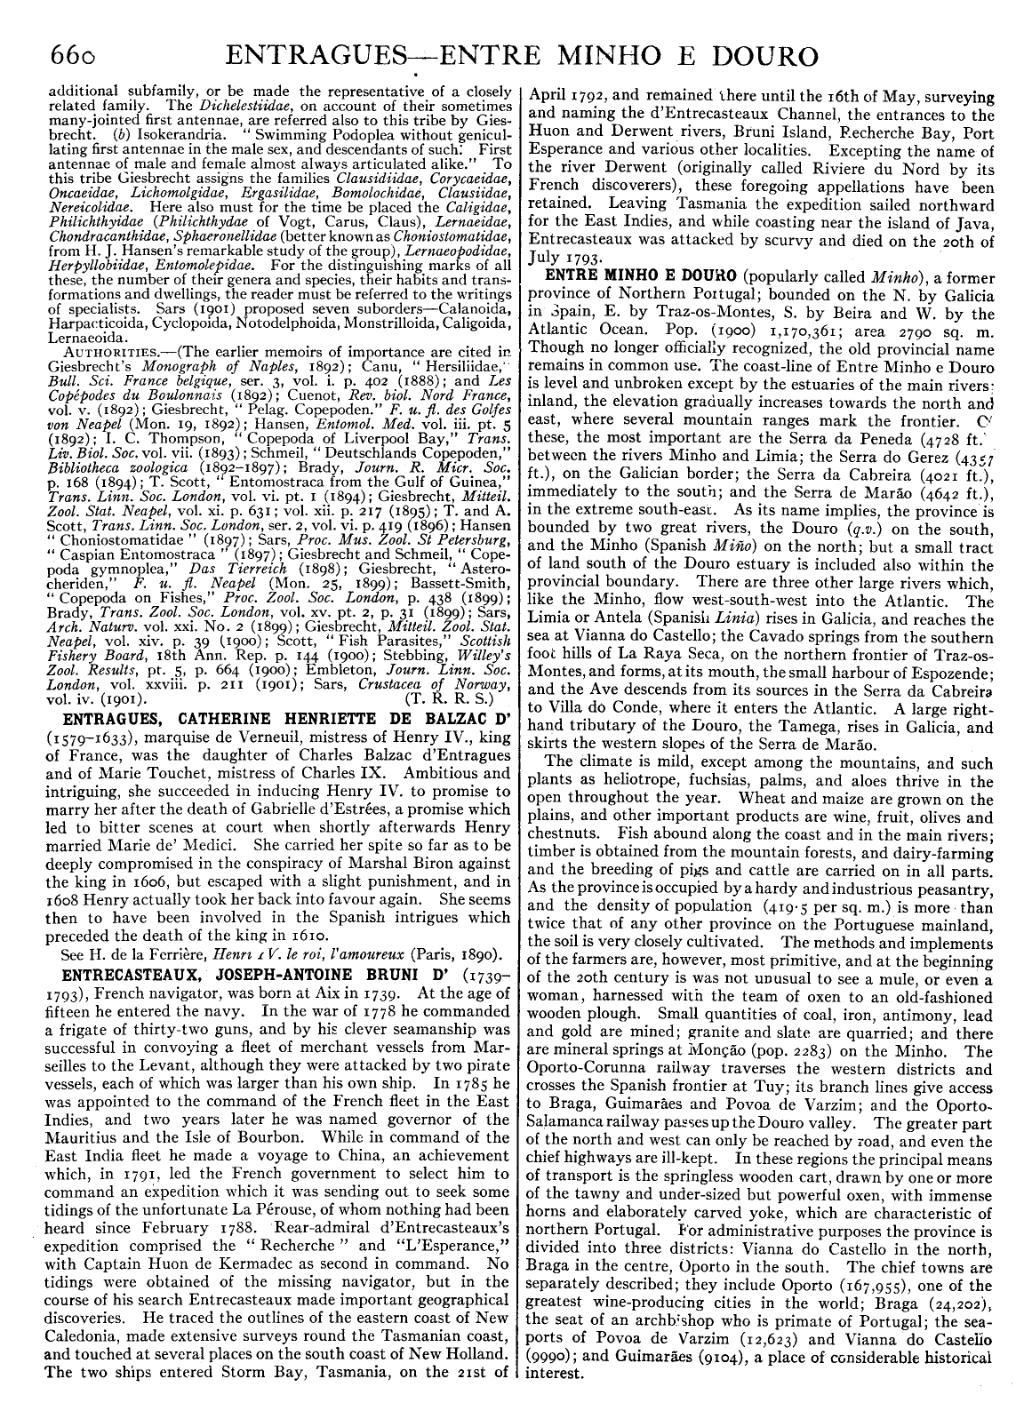 Page EB1911 - Volume 09.djvu 692 - Wikisource c642f1c6130